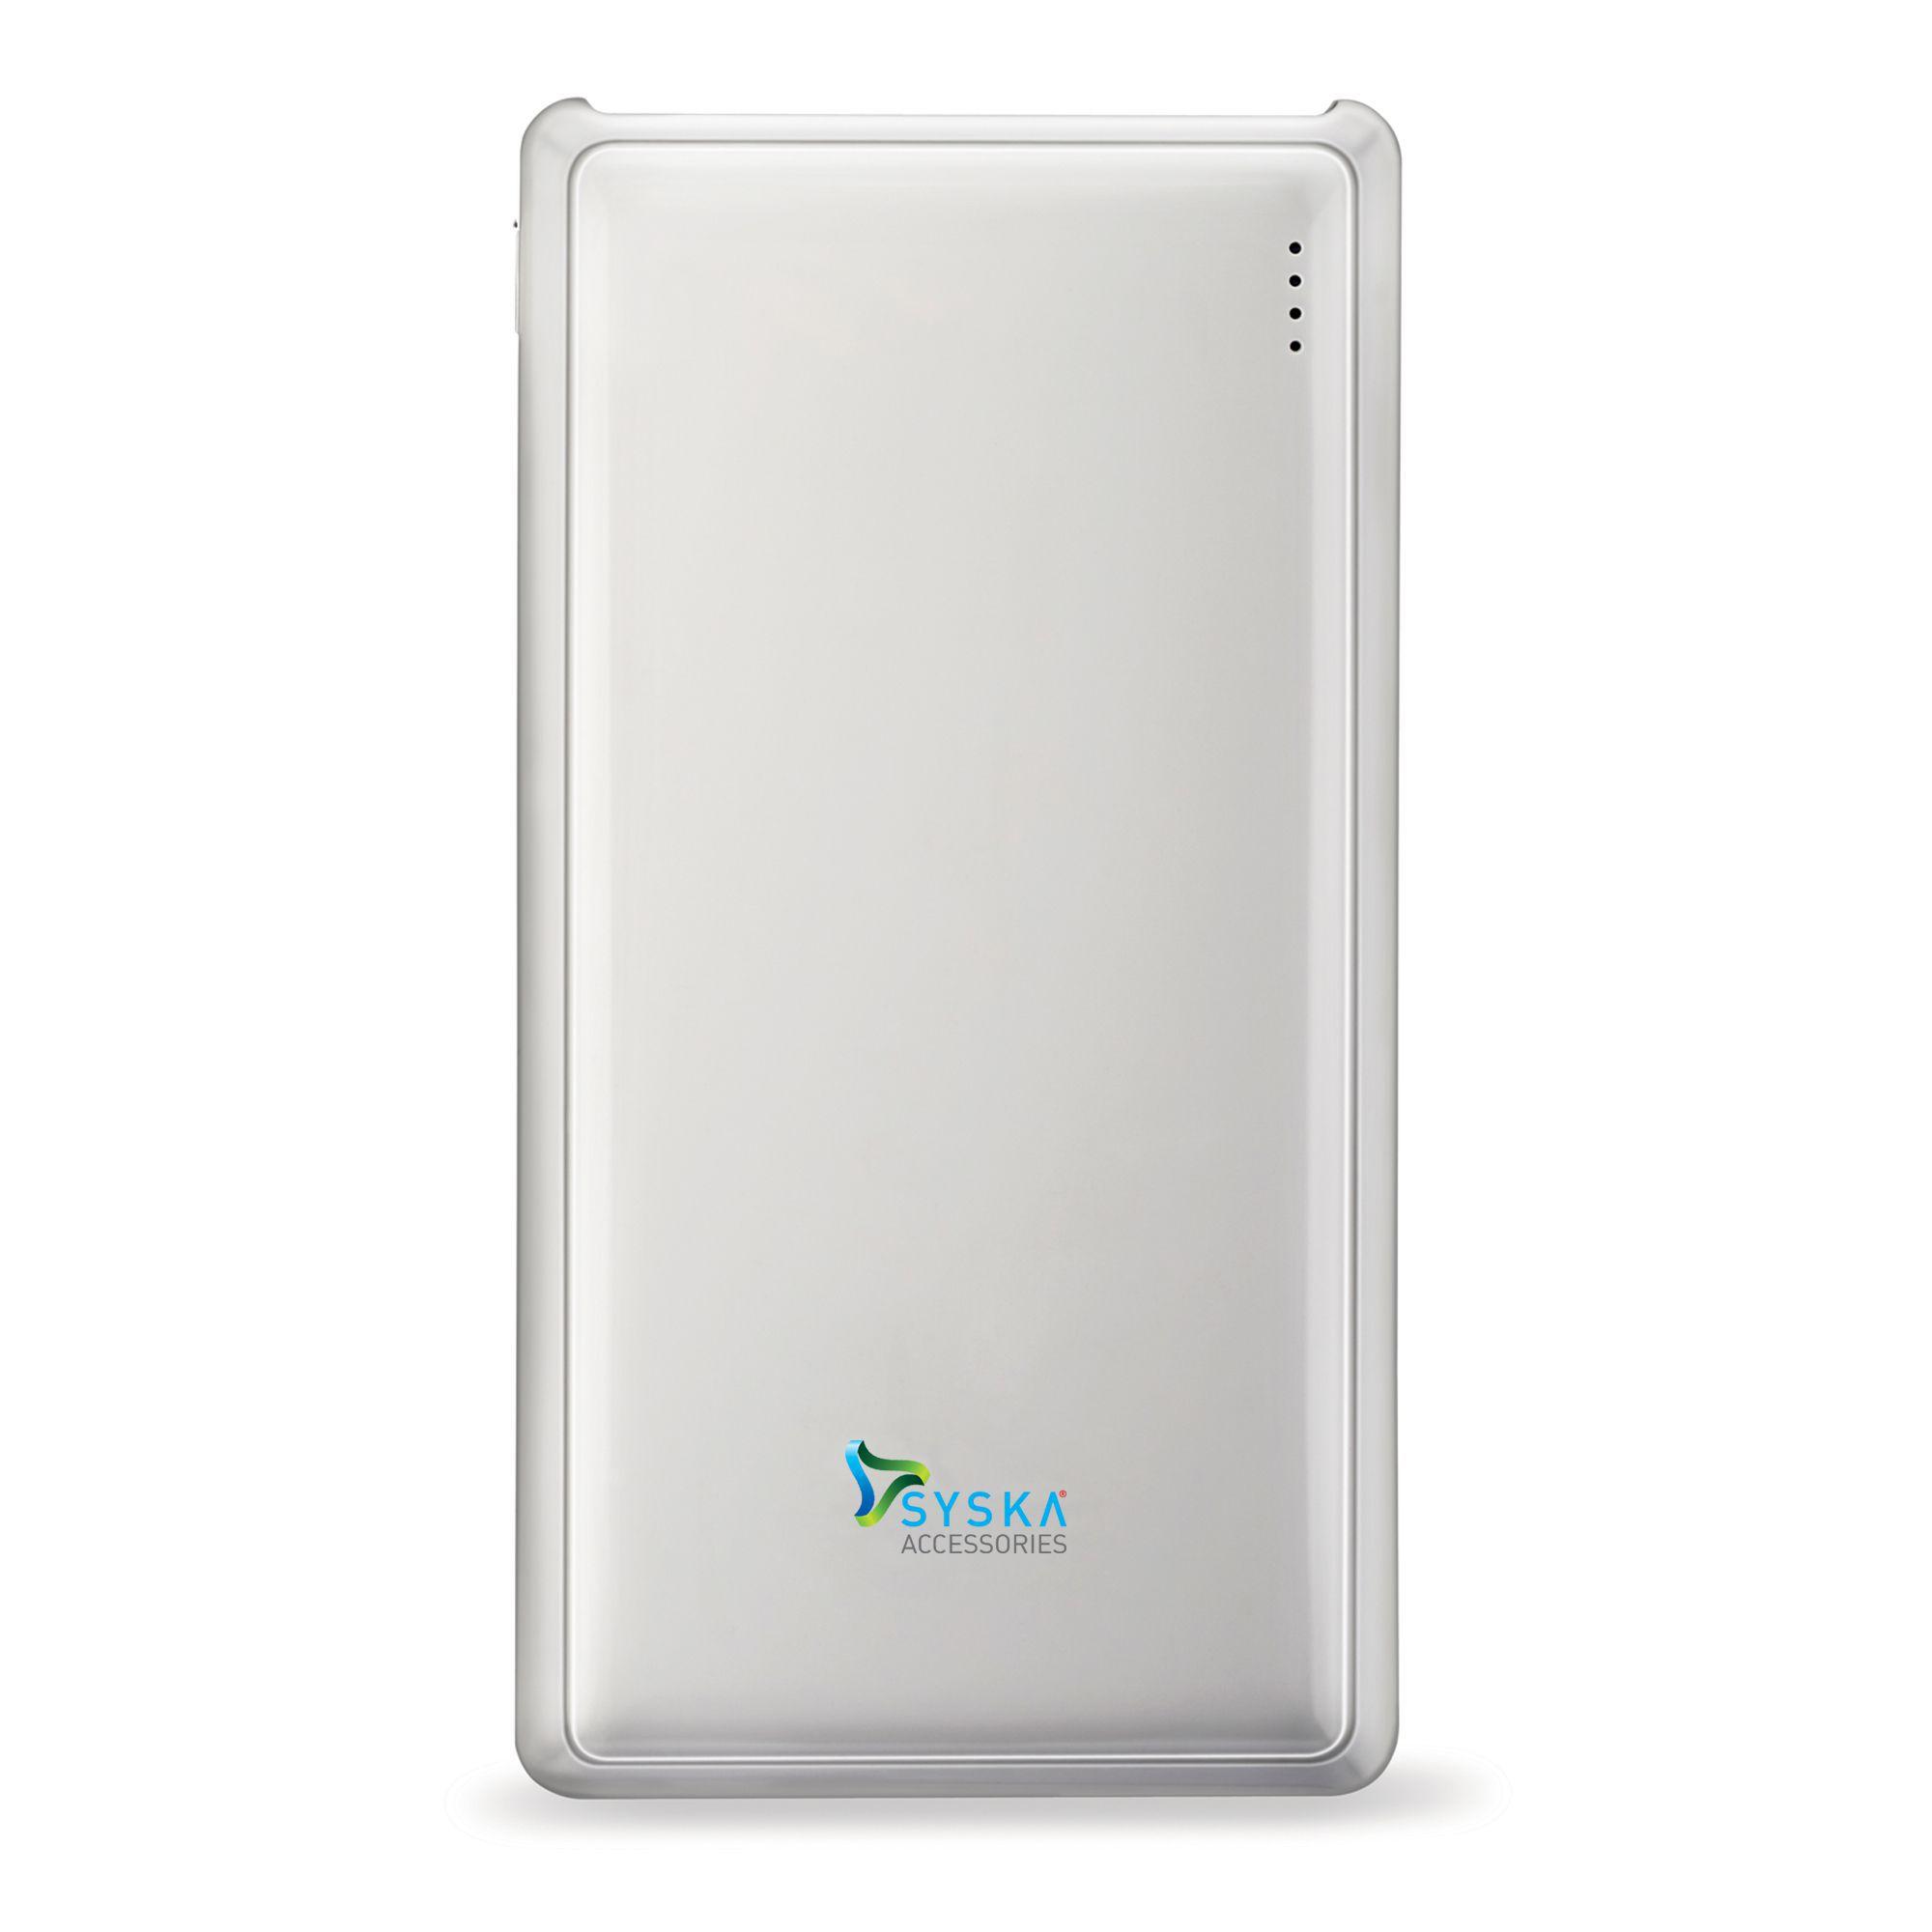 Syska Power Pro 200 20000 -mAh Li-Polymer Power Bank White